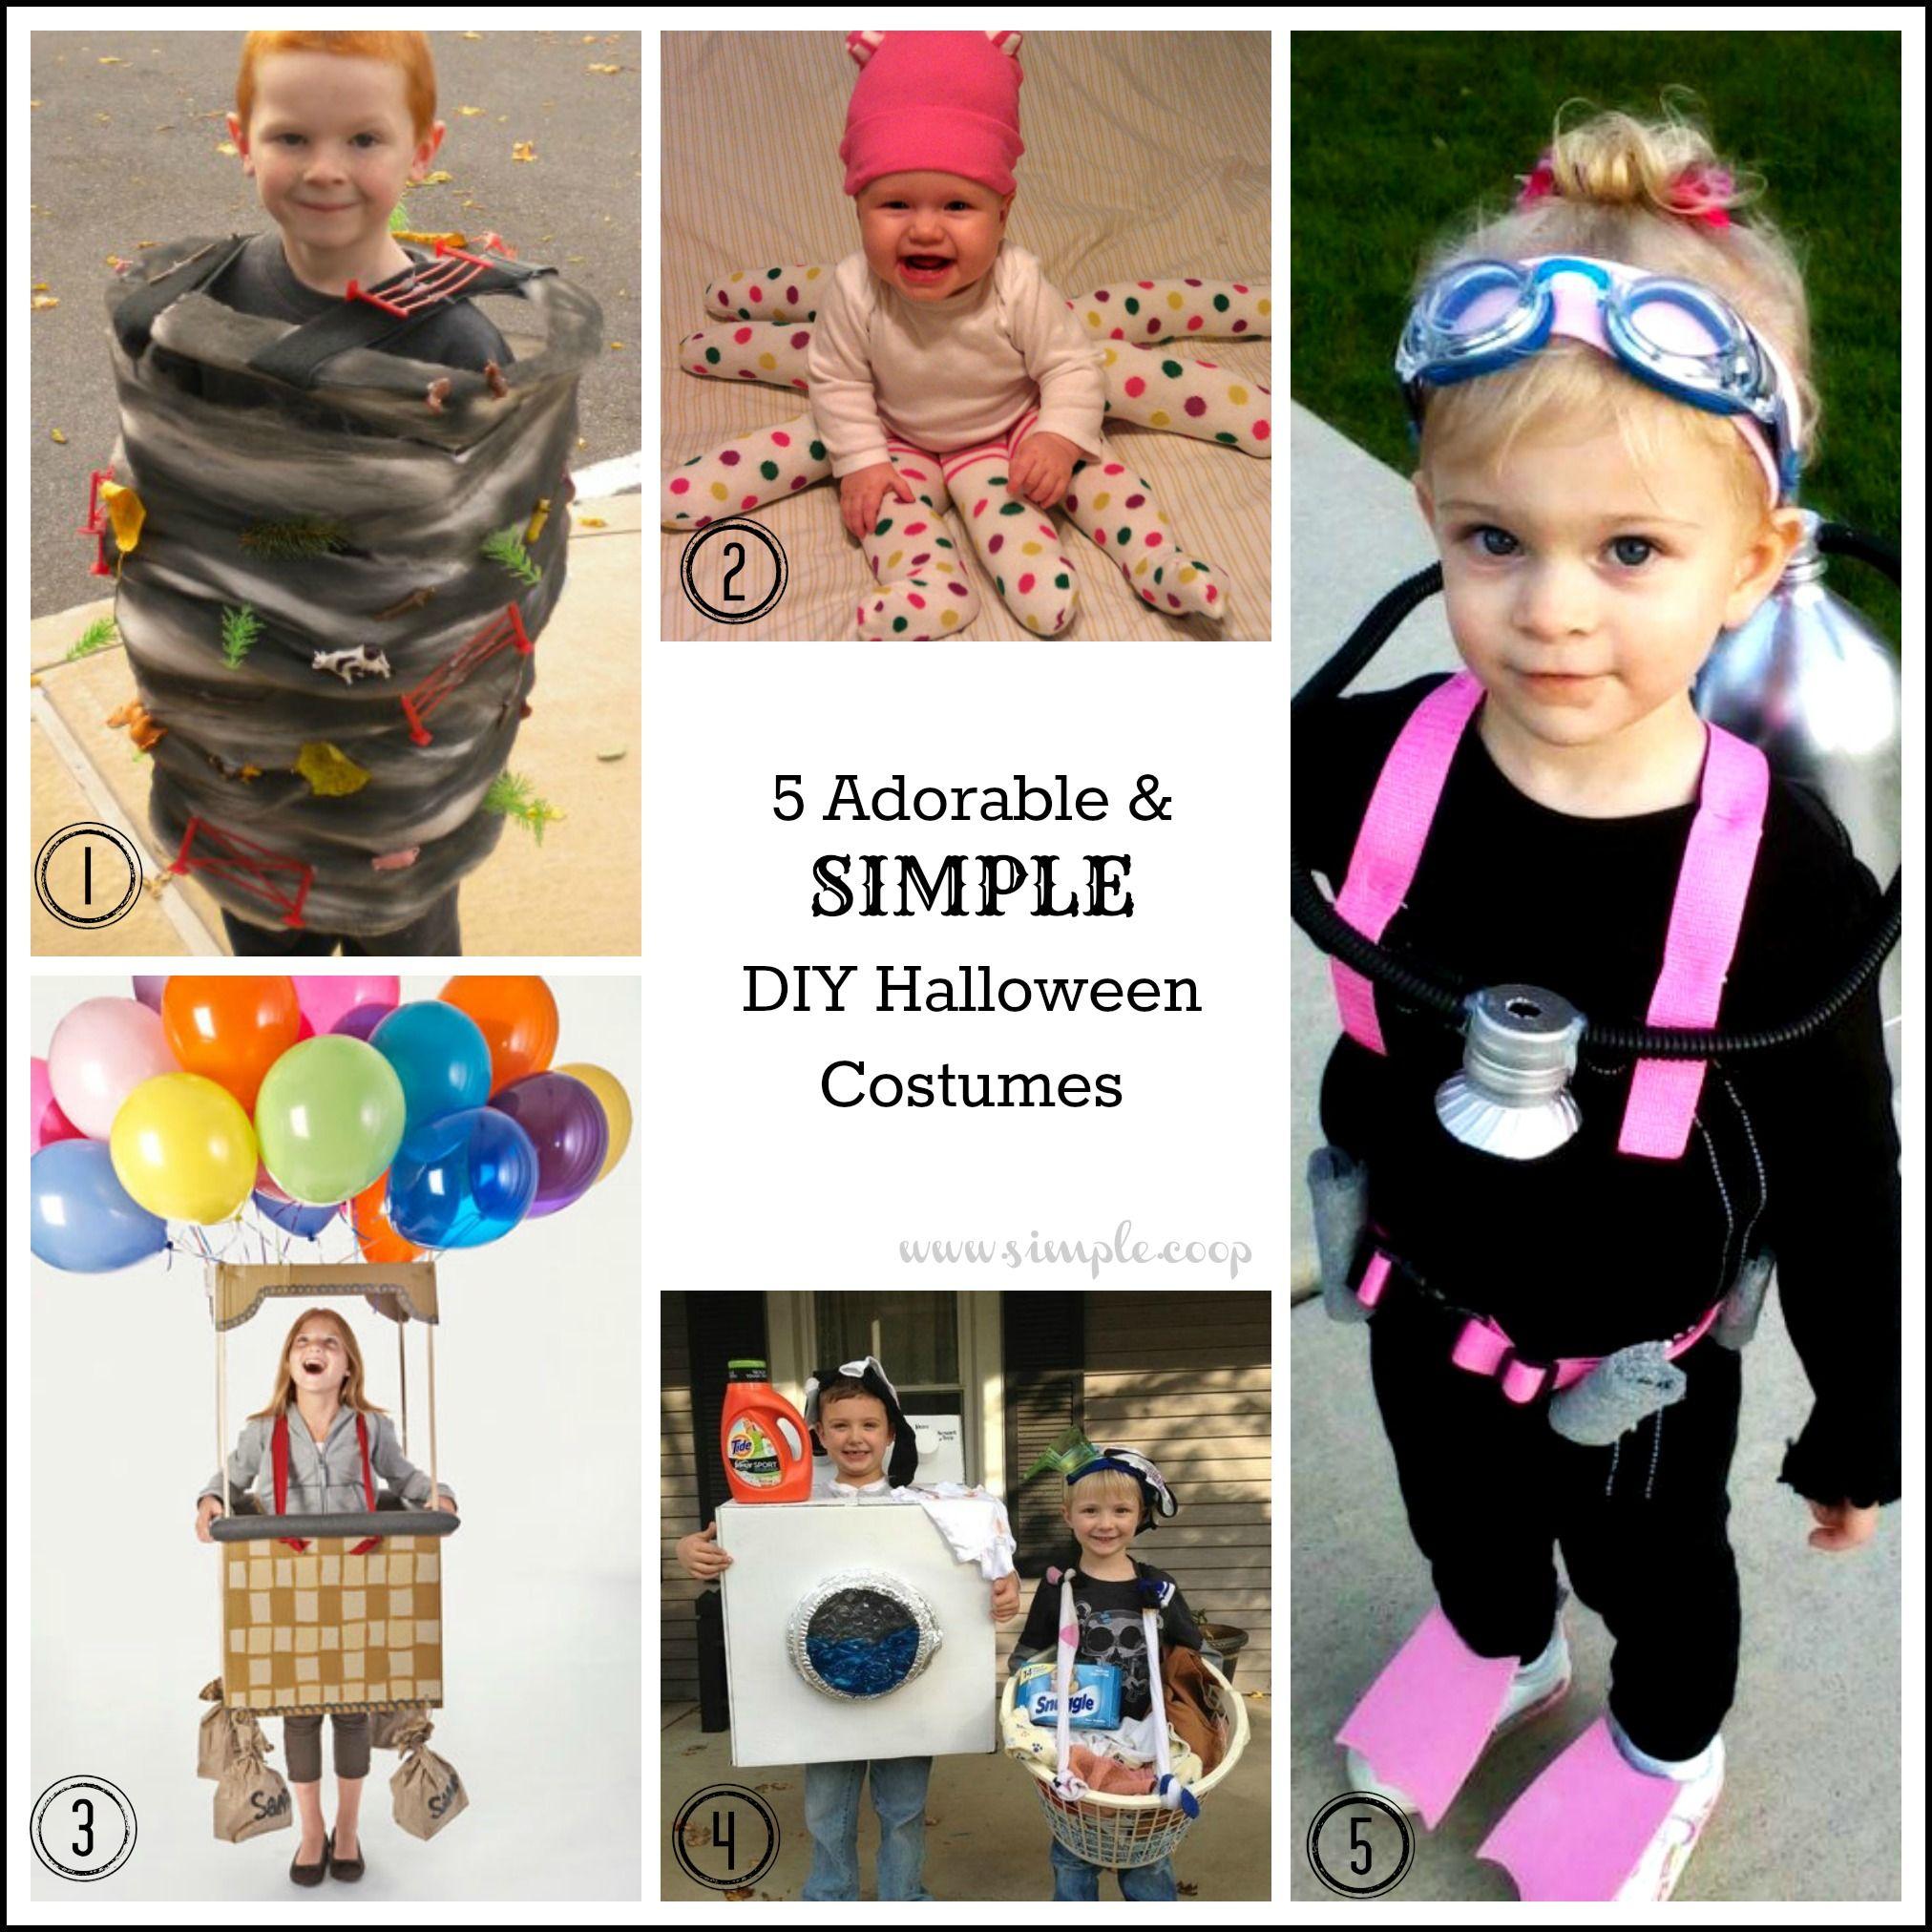 5 adorable simple diy halloween costume ideas octopus is cute - Simple Diy Halloween Costume